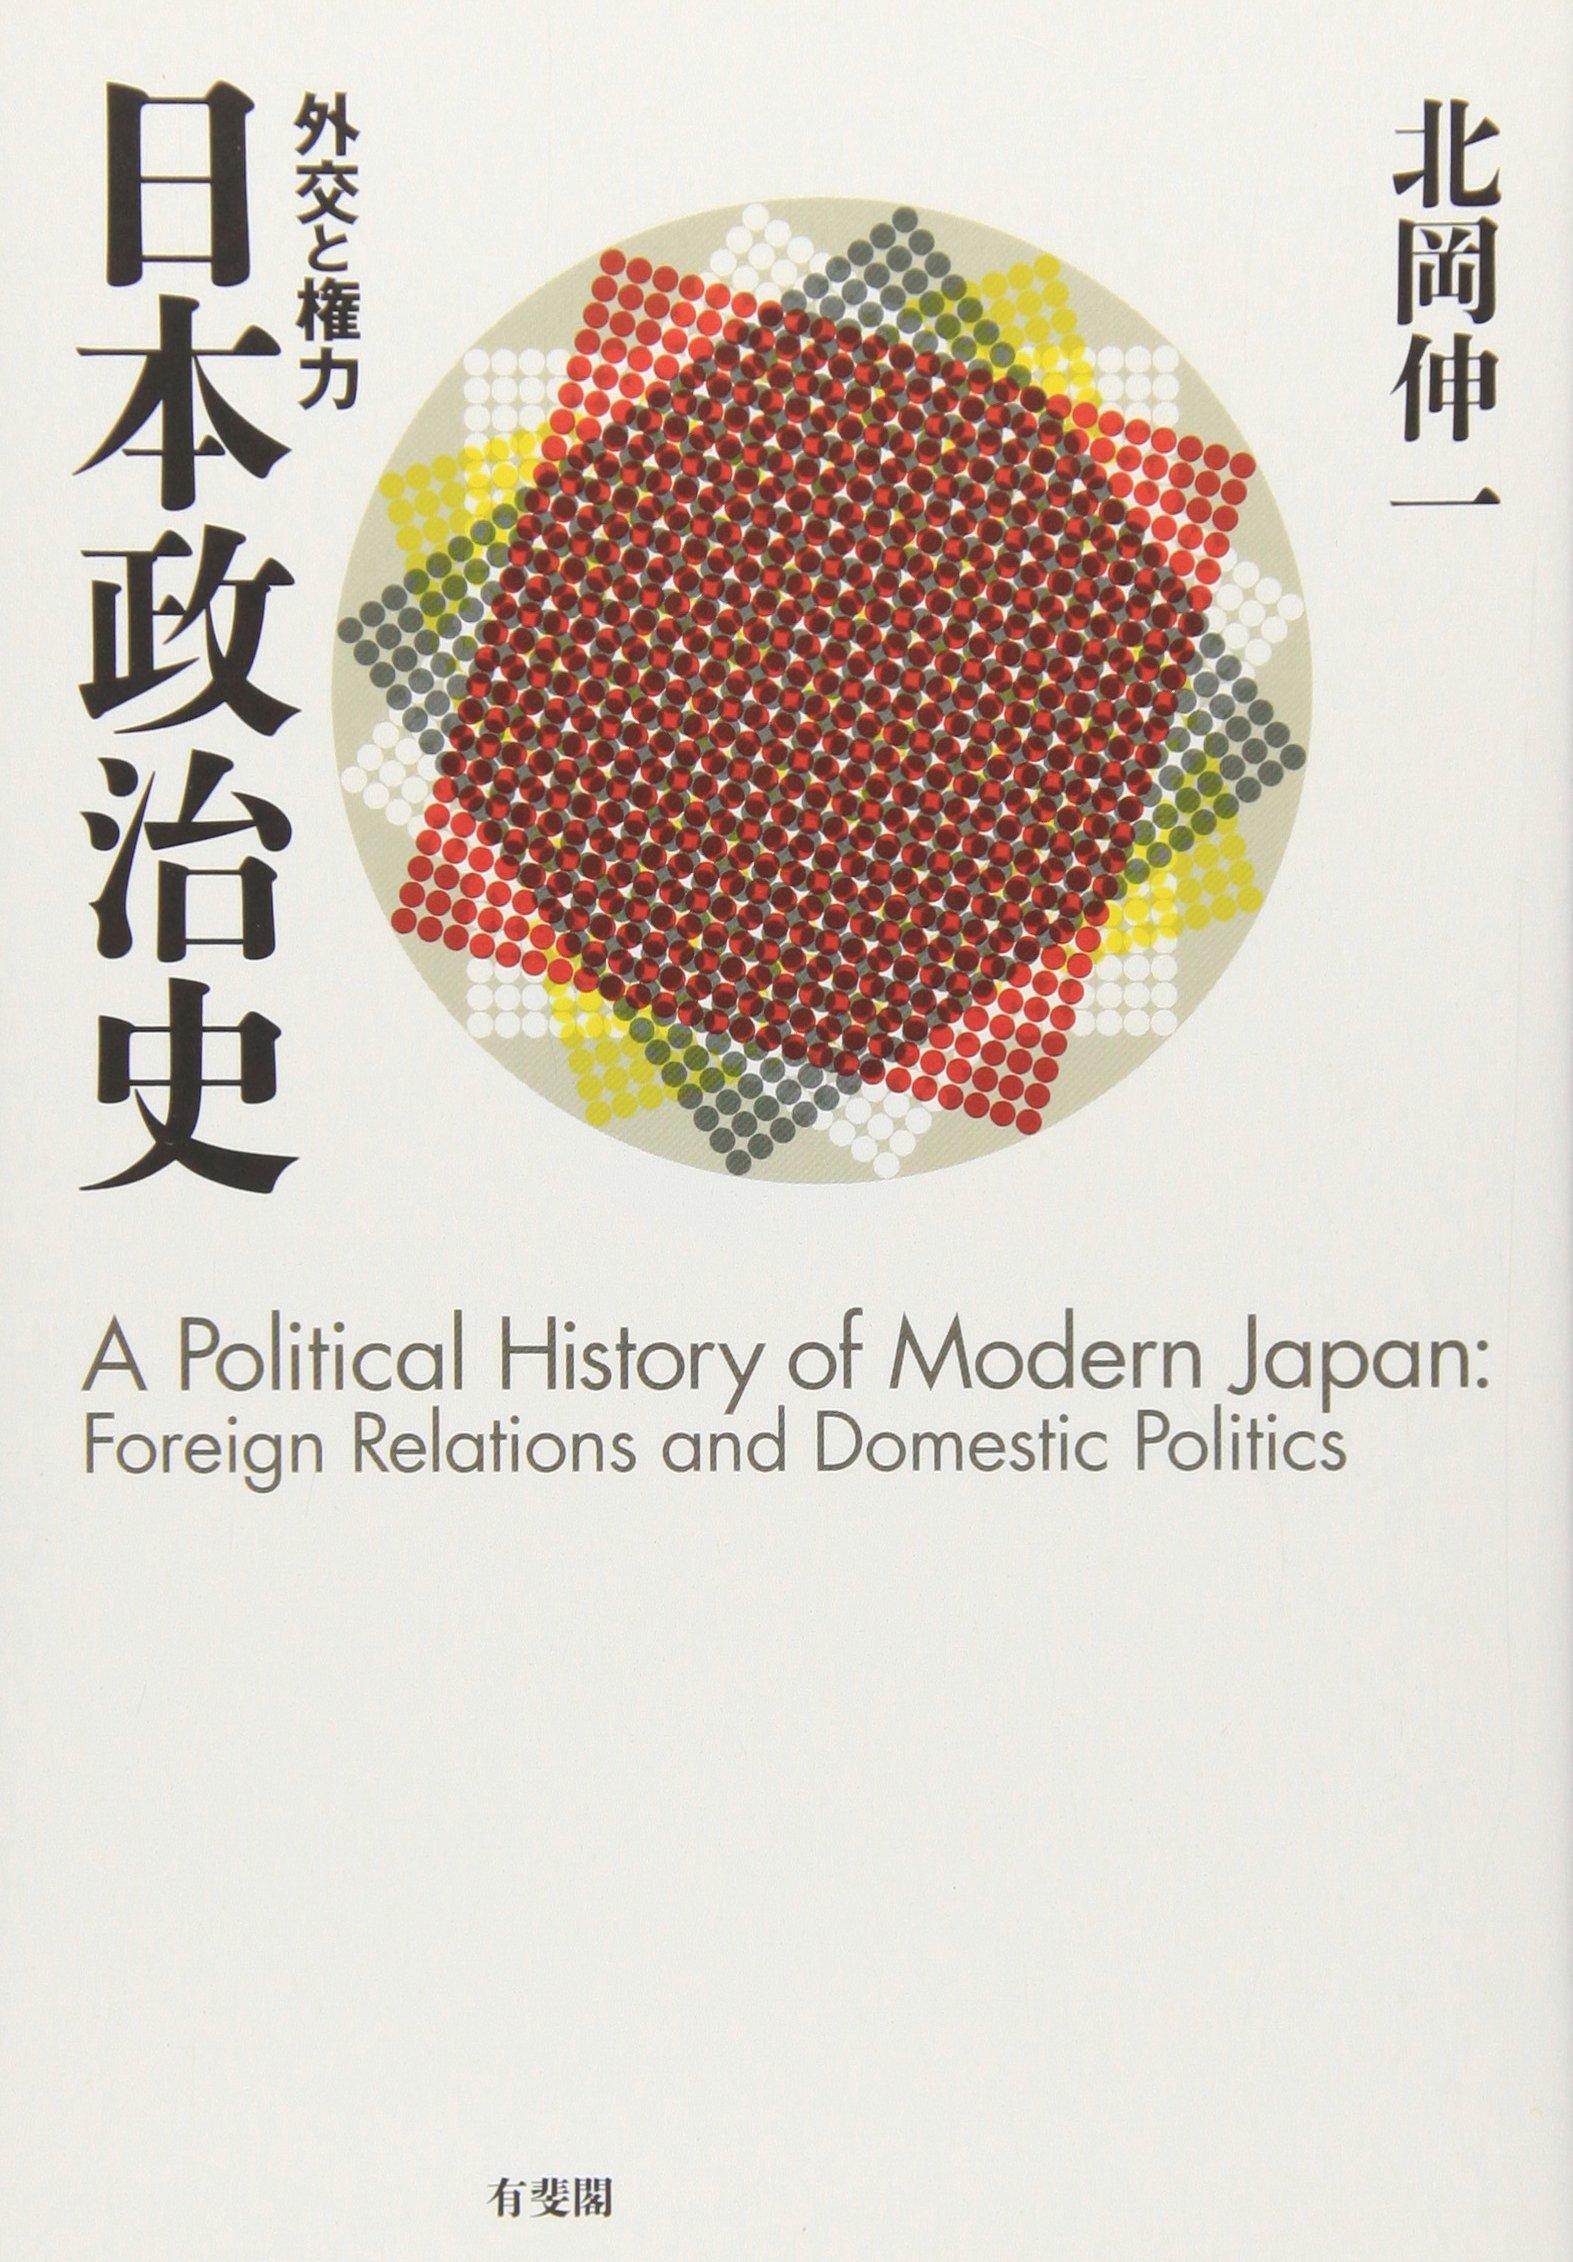 日本政治史 -- 外交と権力   北岡 伸一  本   通販   Amazon